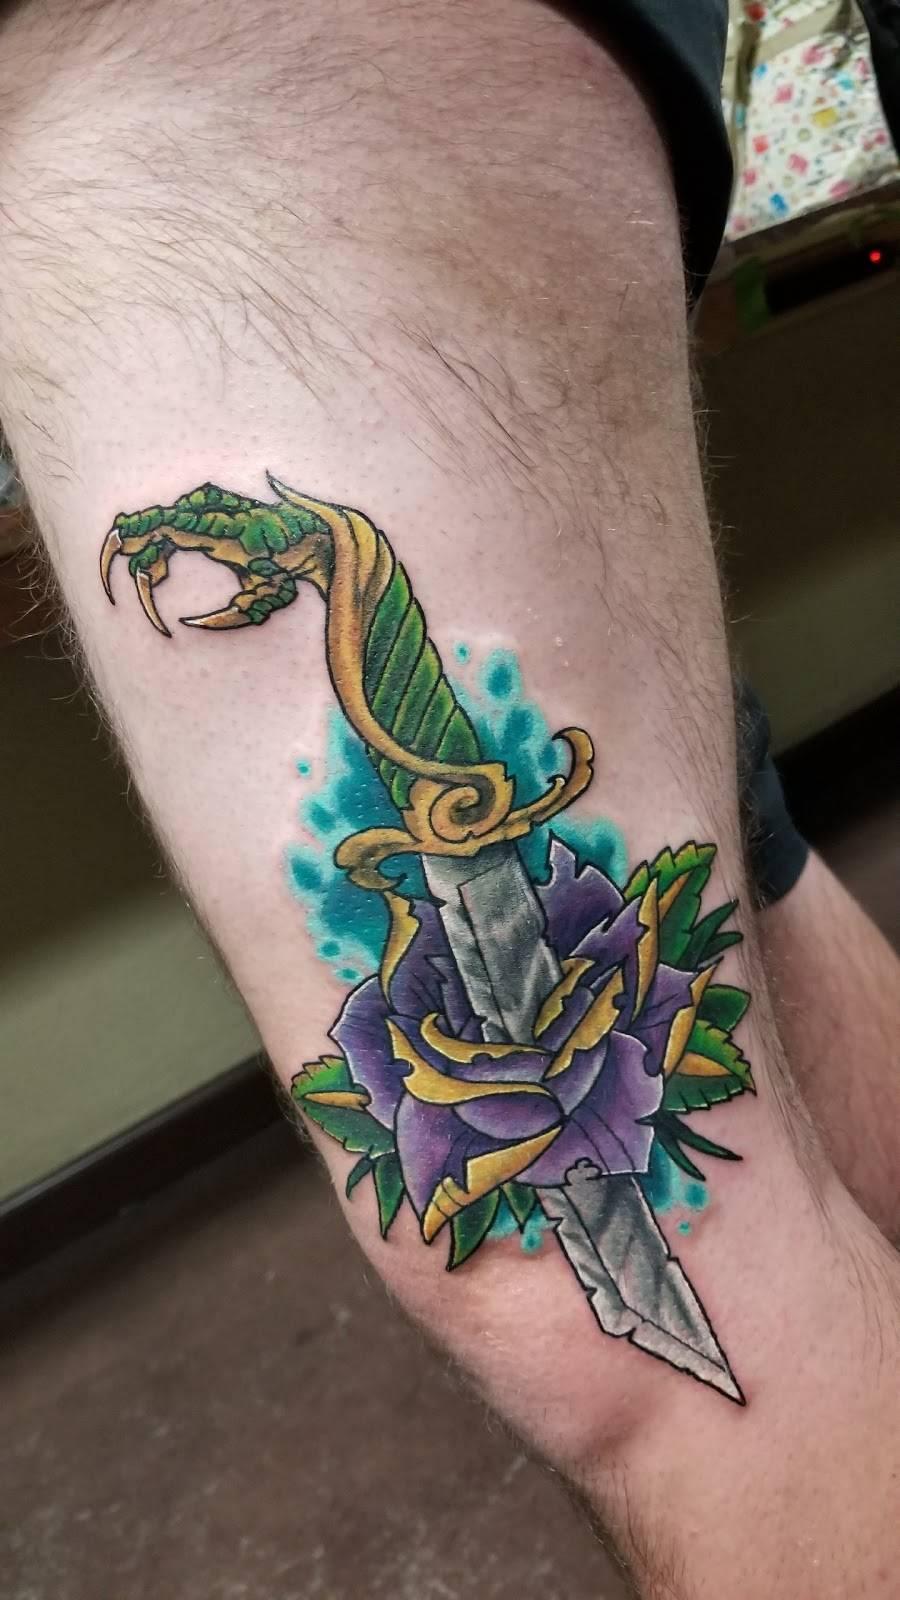 Trivium Tattoo - store  | Photo 5 of 9 | Address: 24465 Sunnymead Boulevard, Moreno Valley, CA 92553, USA | Phone: (951) 438-8506